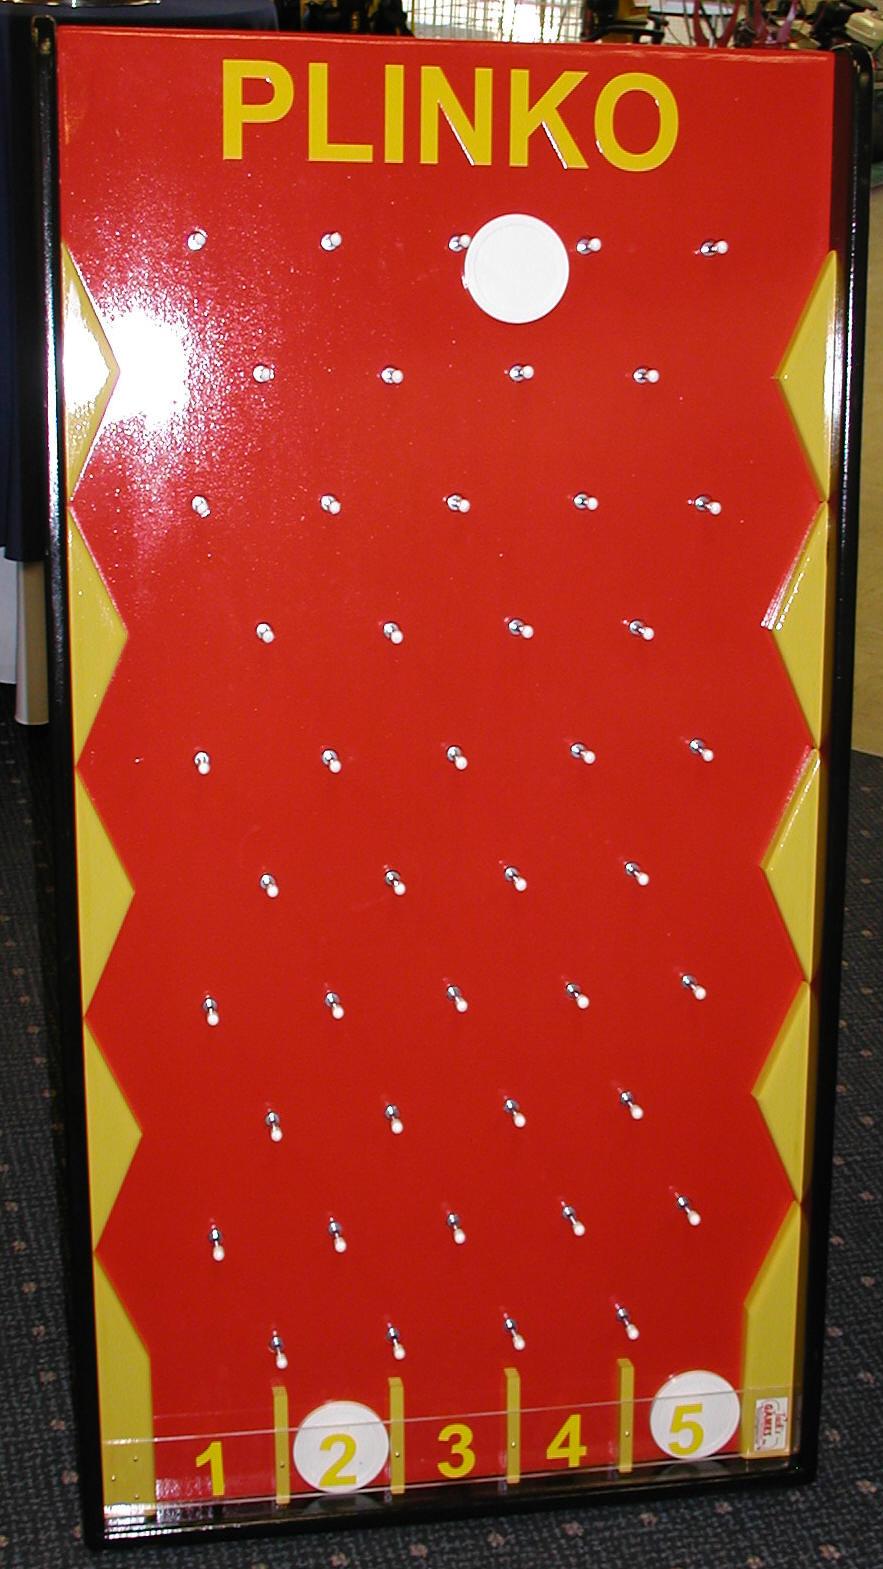 Plinko game of chance